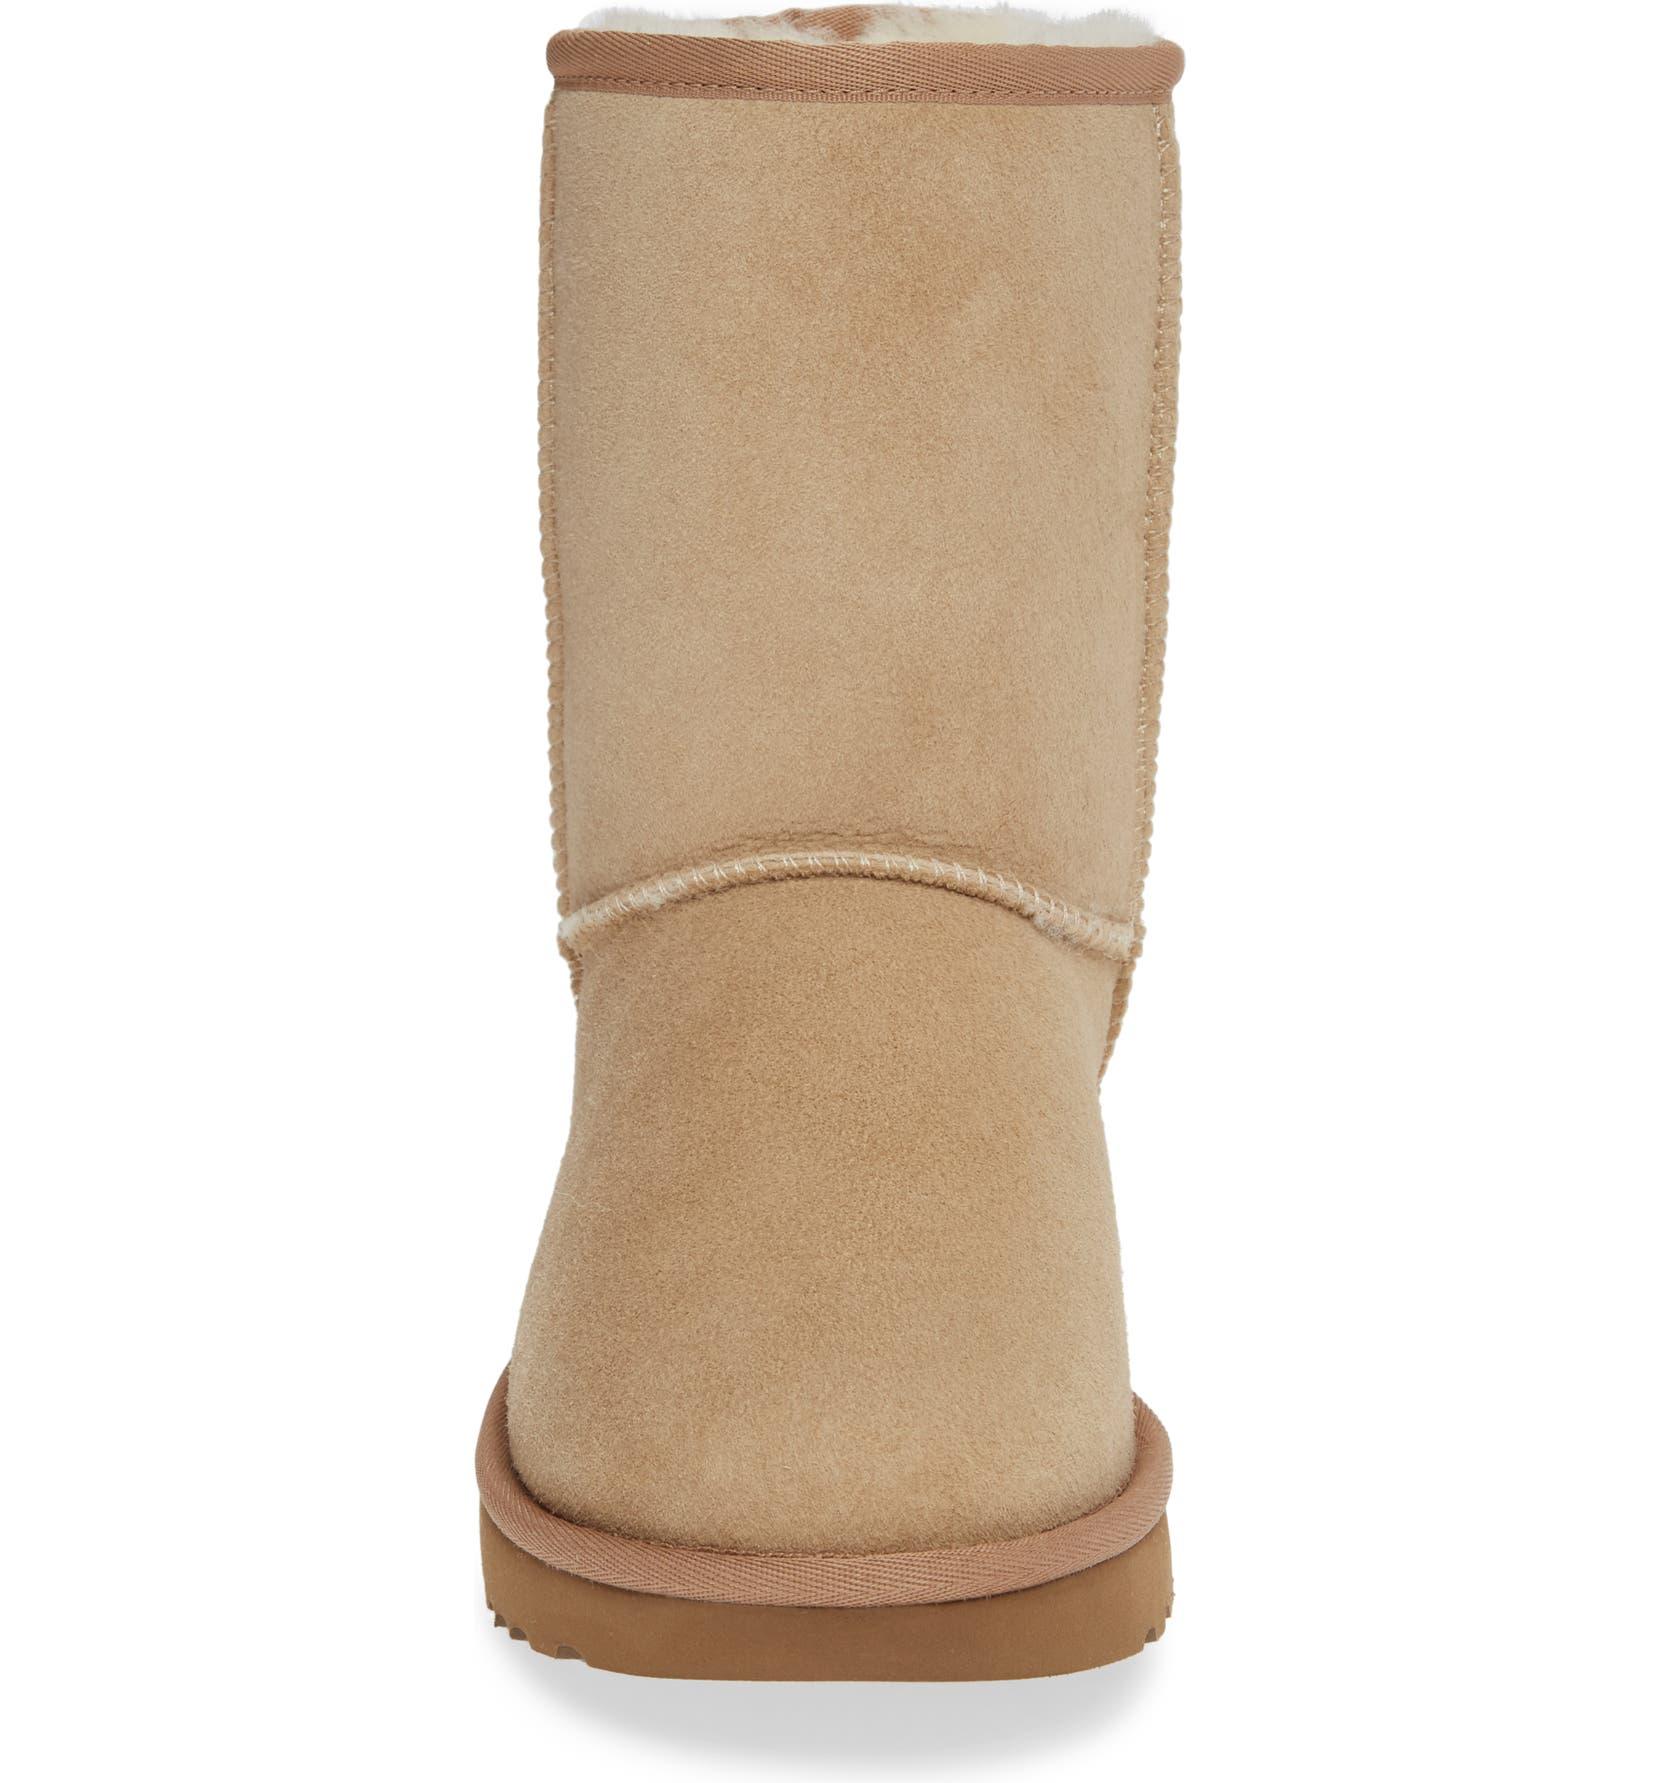 2bfebcb5c75 Classic Short 40:40:40 Genuine Shearling Boot